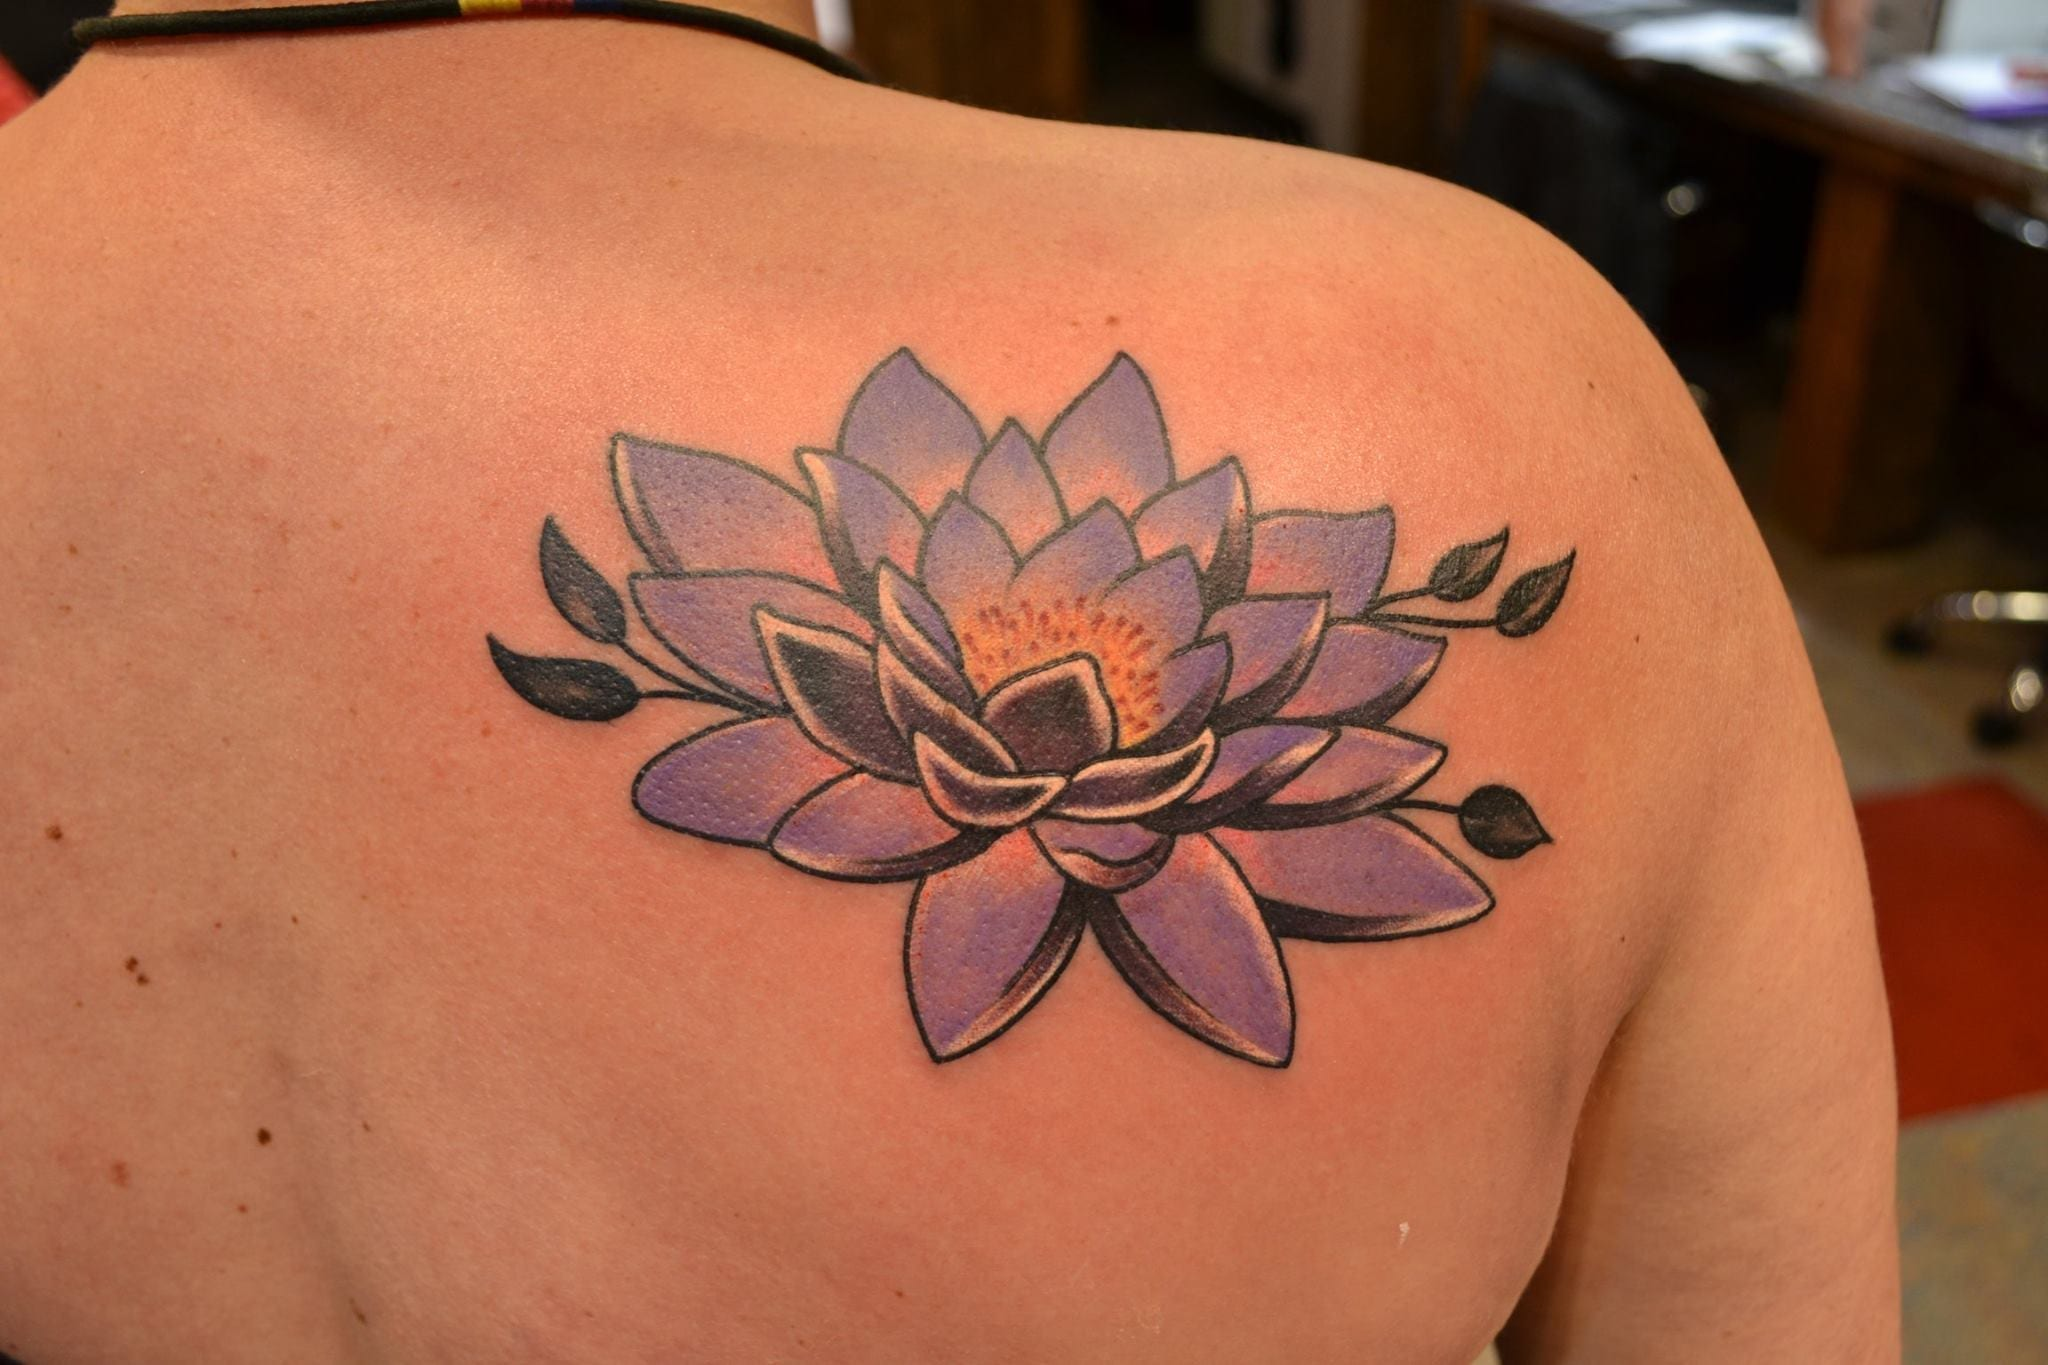 Precisos Disenos De Tatuajes De La Flor De Loto